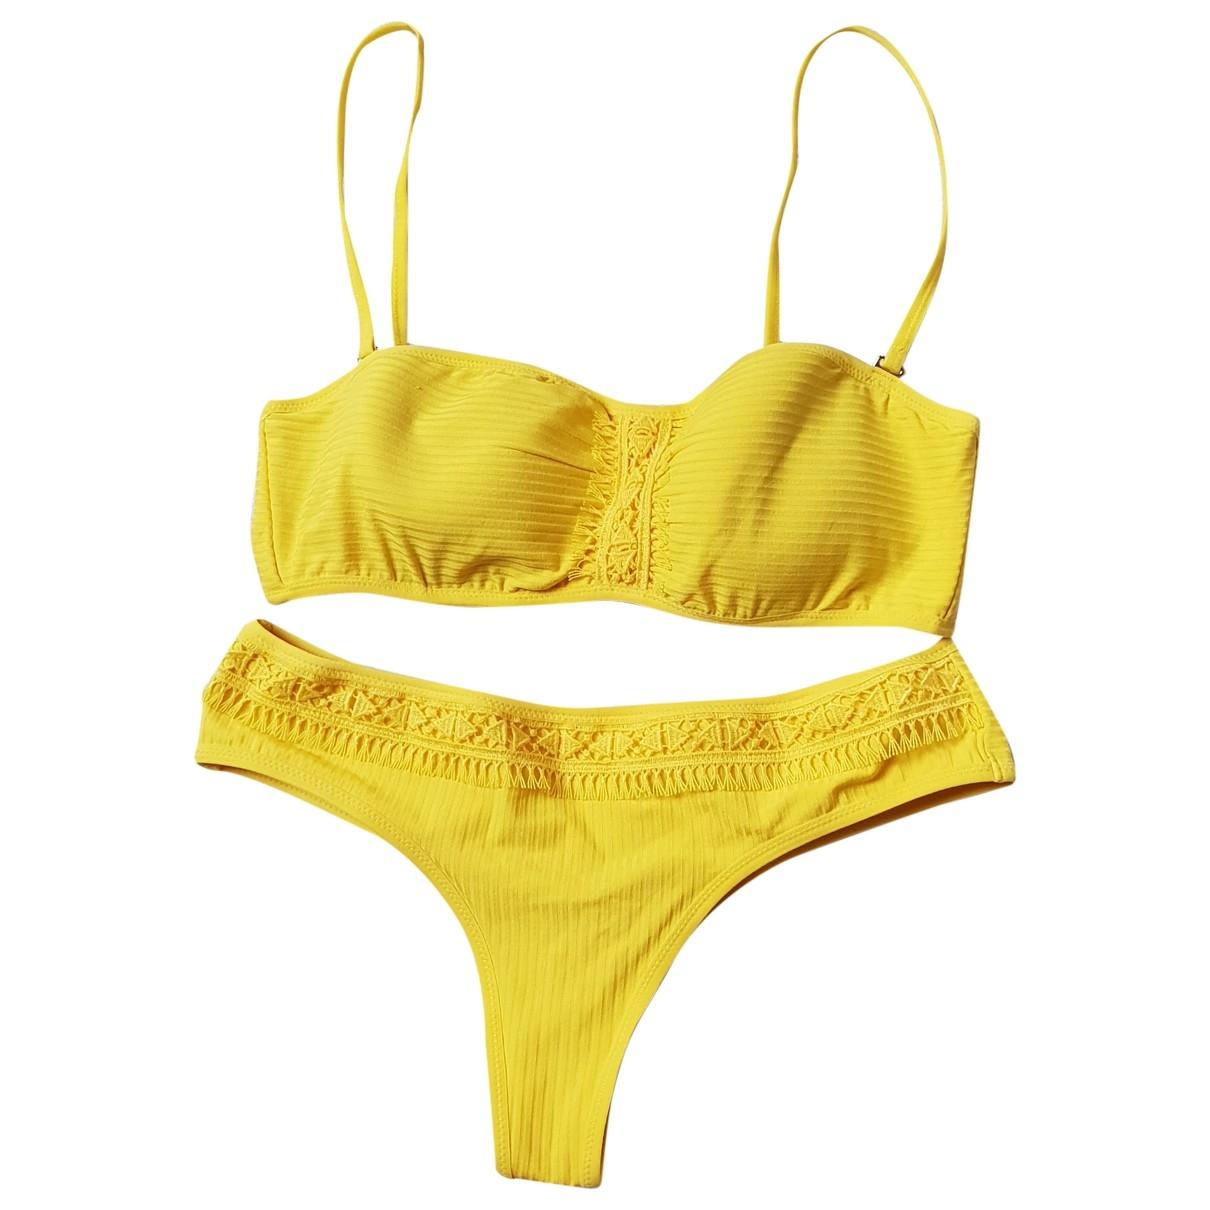 Andres Sarda \N Badeanzug in  Gelb Polyester